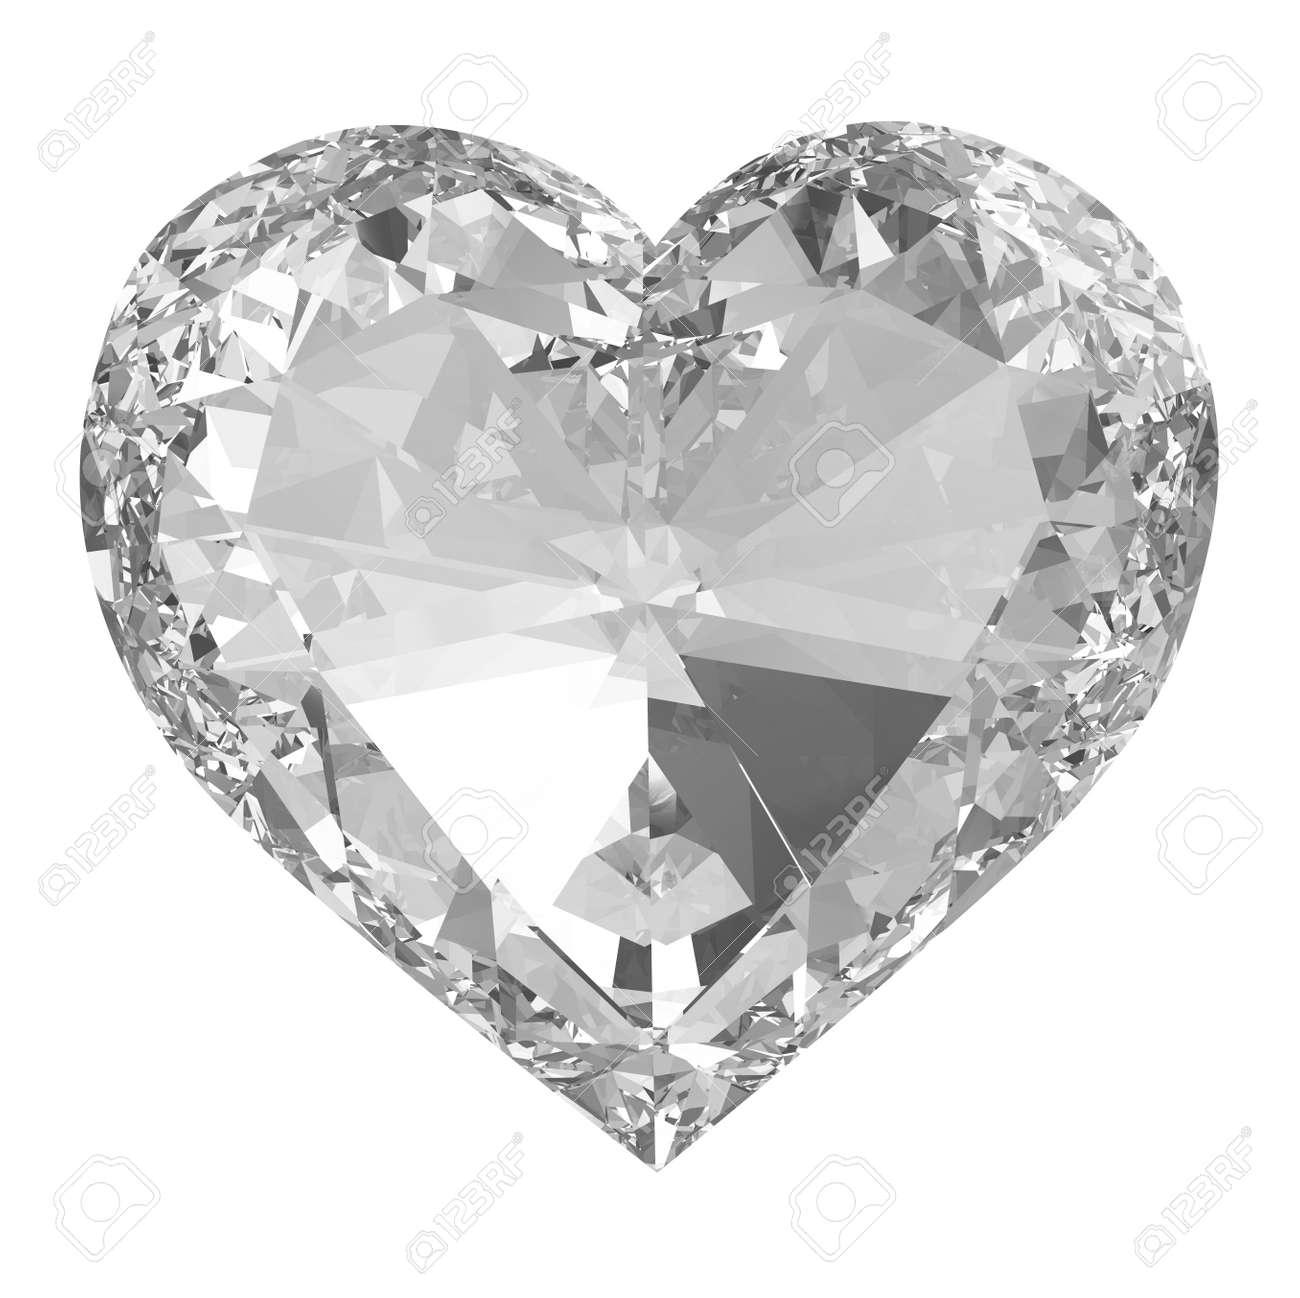 Diamond heart isolated Stock Photo - 17497951